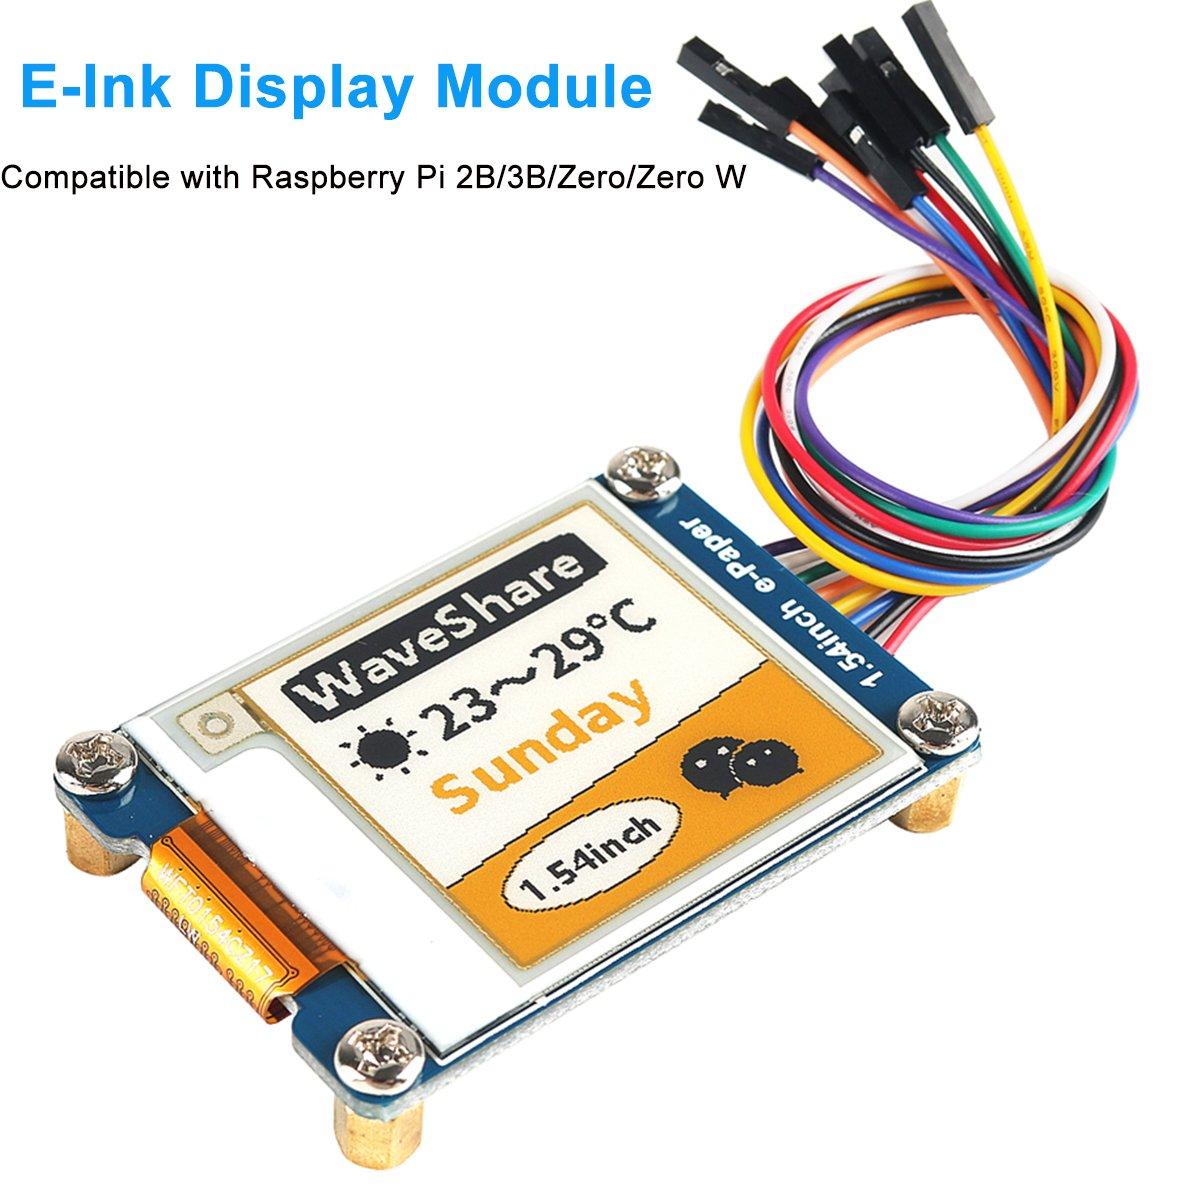 MakerHawk E-Ink Display Module, 1.54 inch E-Paper Display Module Screen Panel SPI Interface for Arduino Raspberry Pi 2B/3B/Zero/Zero W, Three Color Low Power Consumption, Wide Viewing Angle